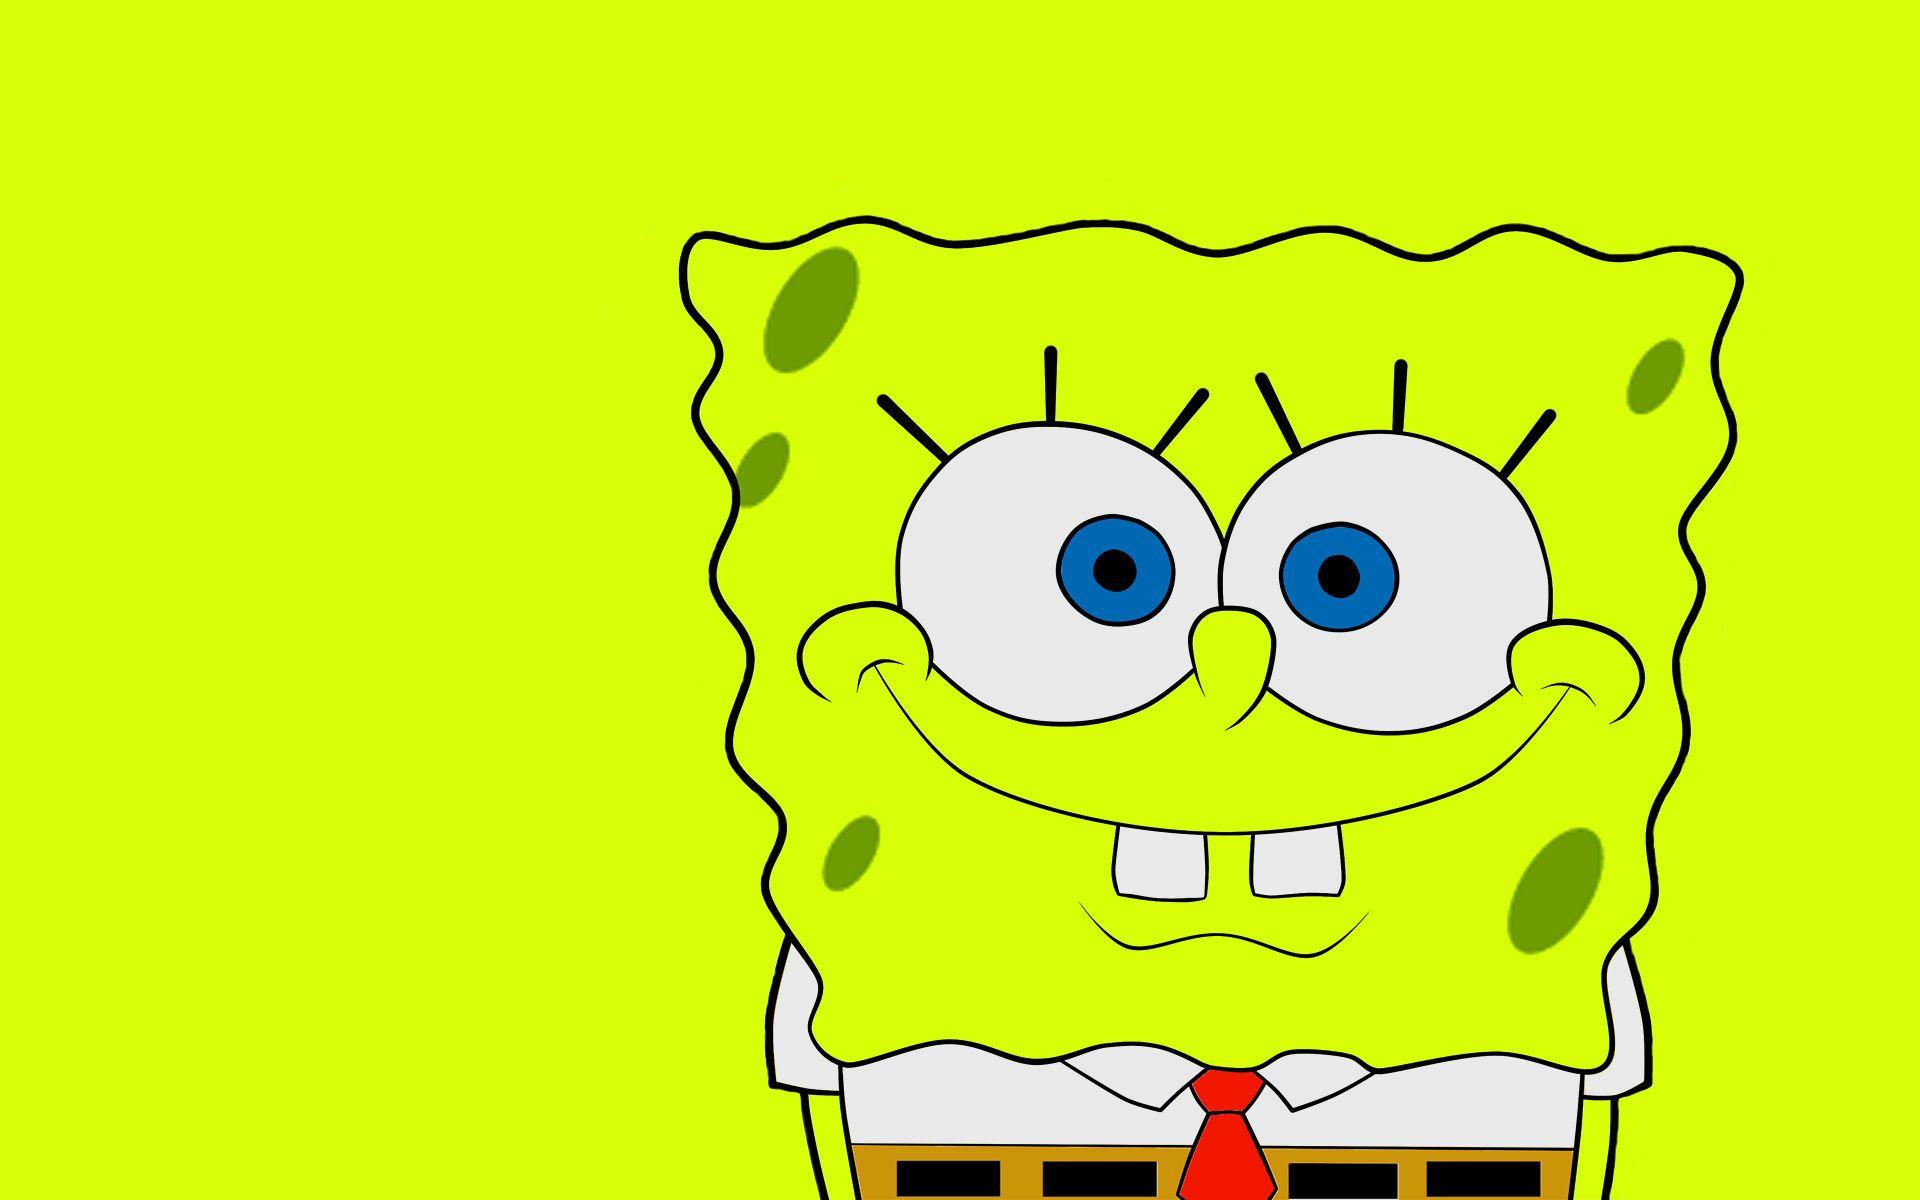 Spongebob Squarepants Hd Wallpapers Cartoon Anime Wallpaper